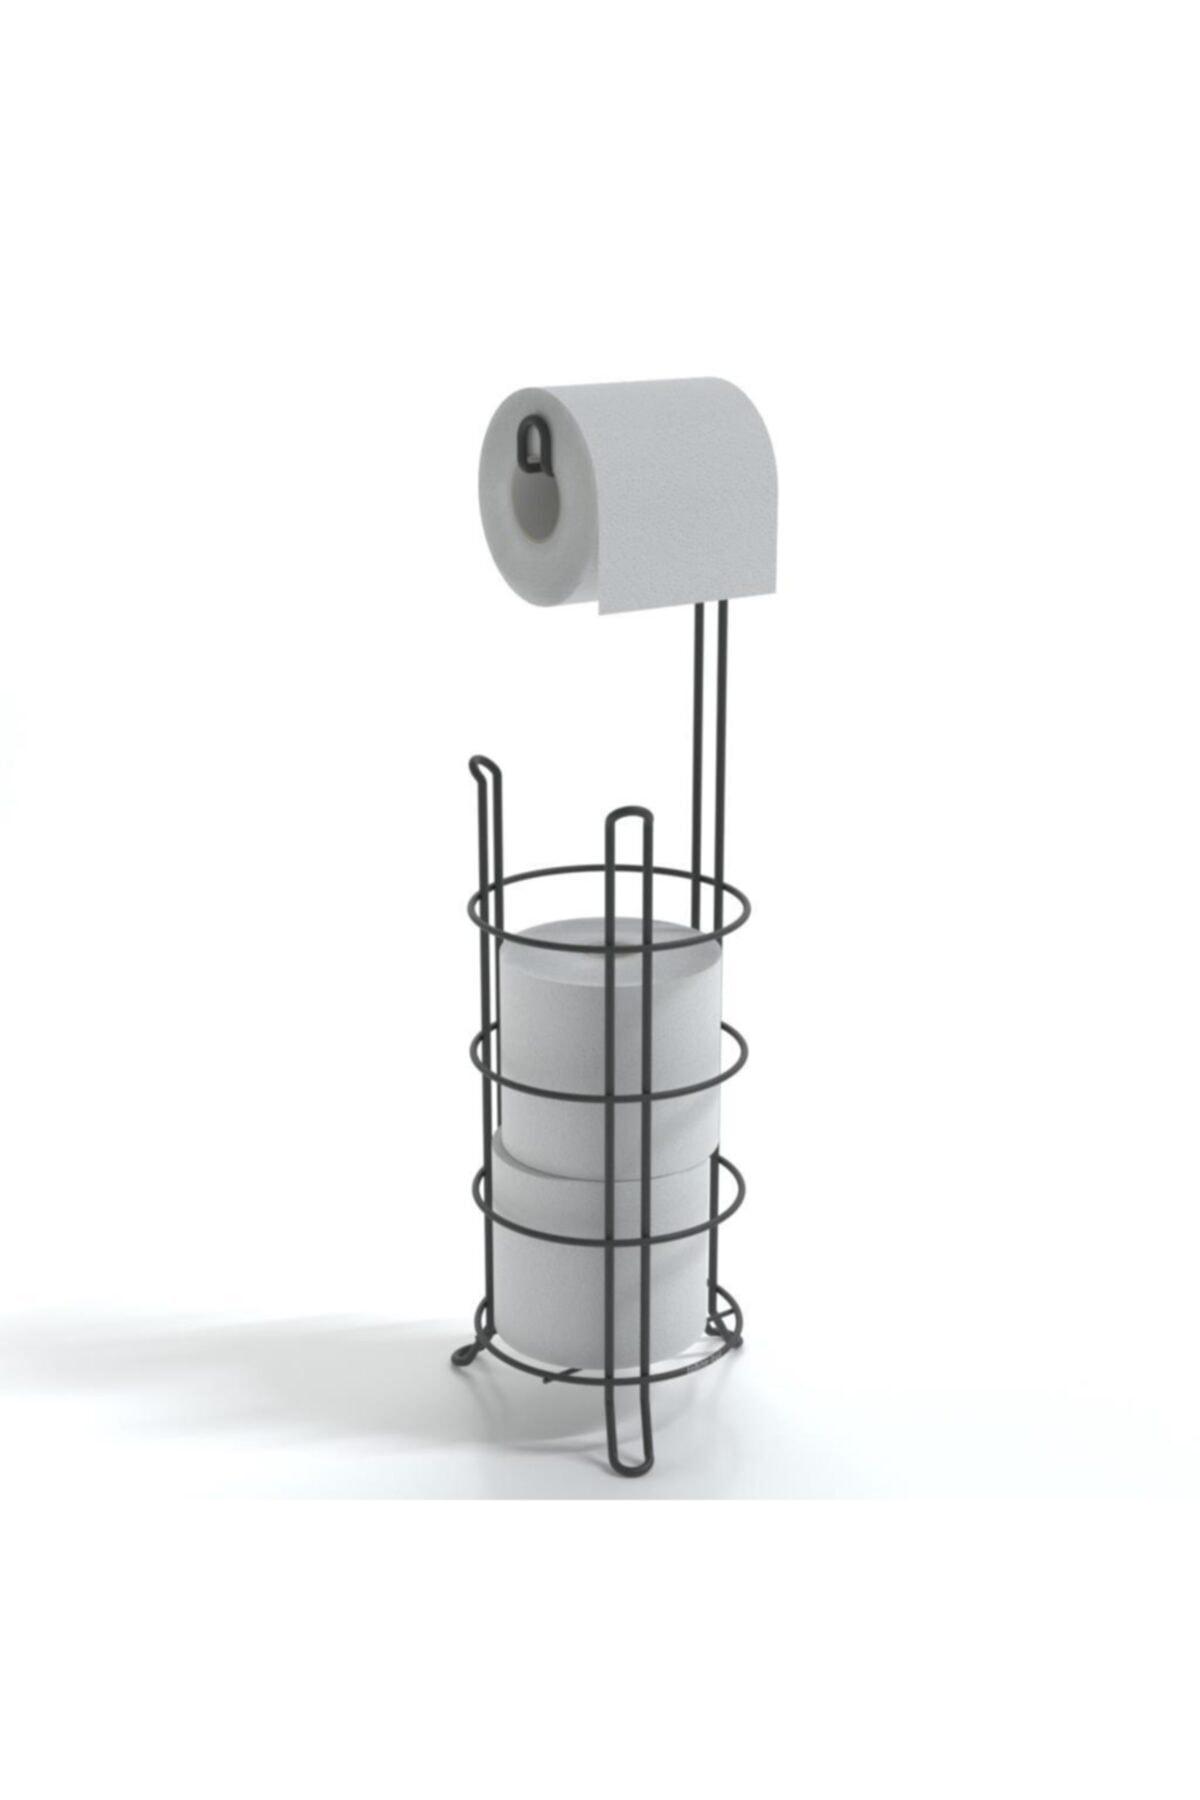 Ayaklı Yedekli Wc Tuvalet Kağıtlık Mat Siyah Mg093